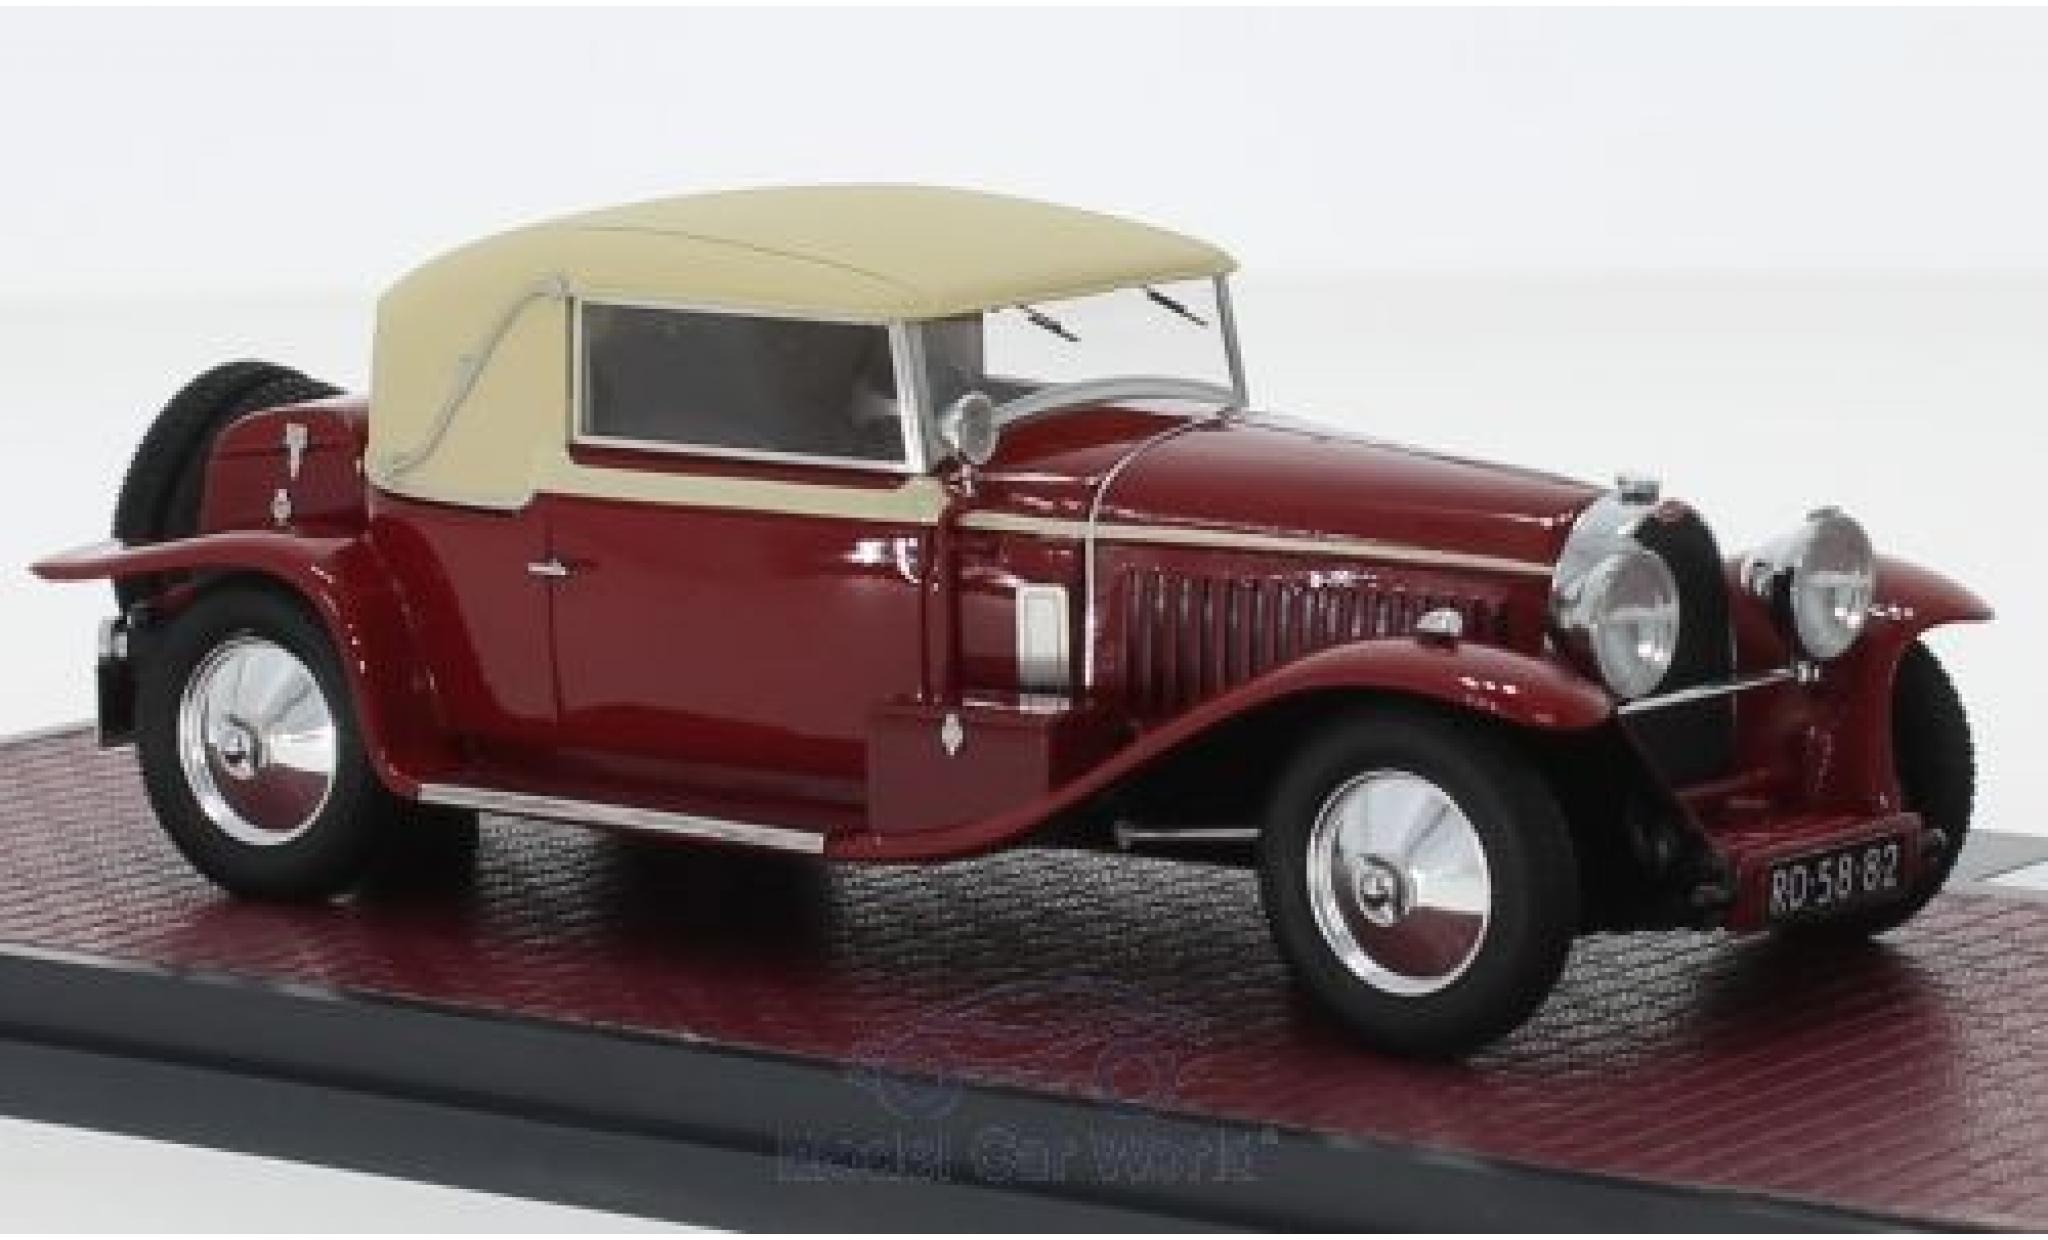 Bugatti 46 1/43 Matrix Type Faux Cabriolet rouge/beige RHD 1930 Veth & Zoon